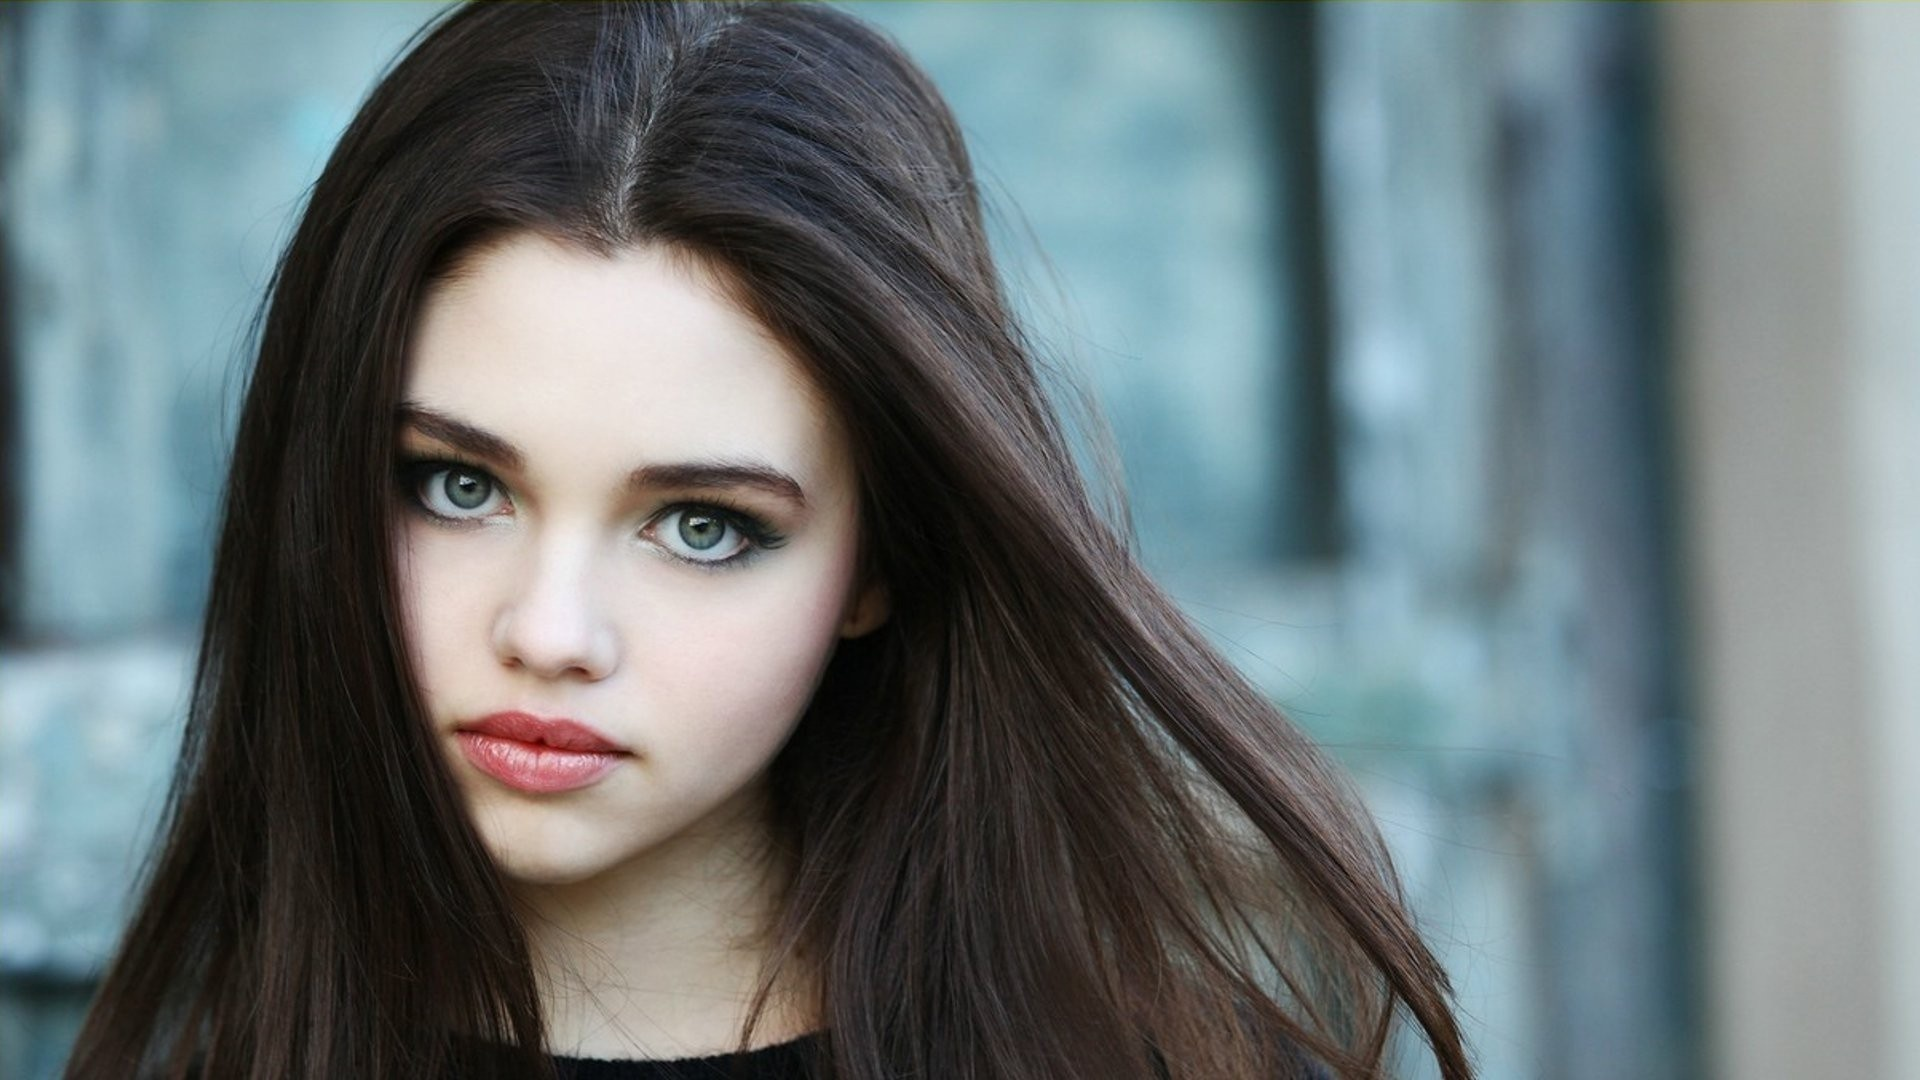 Картинки про красивые глаза девушки